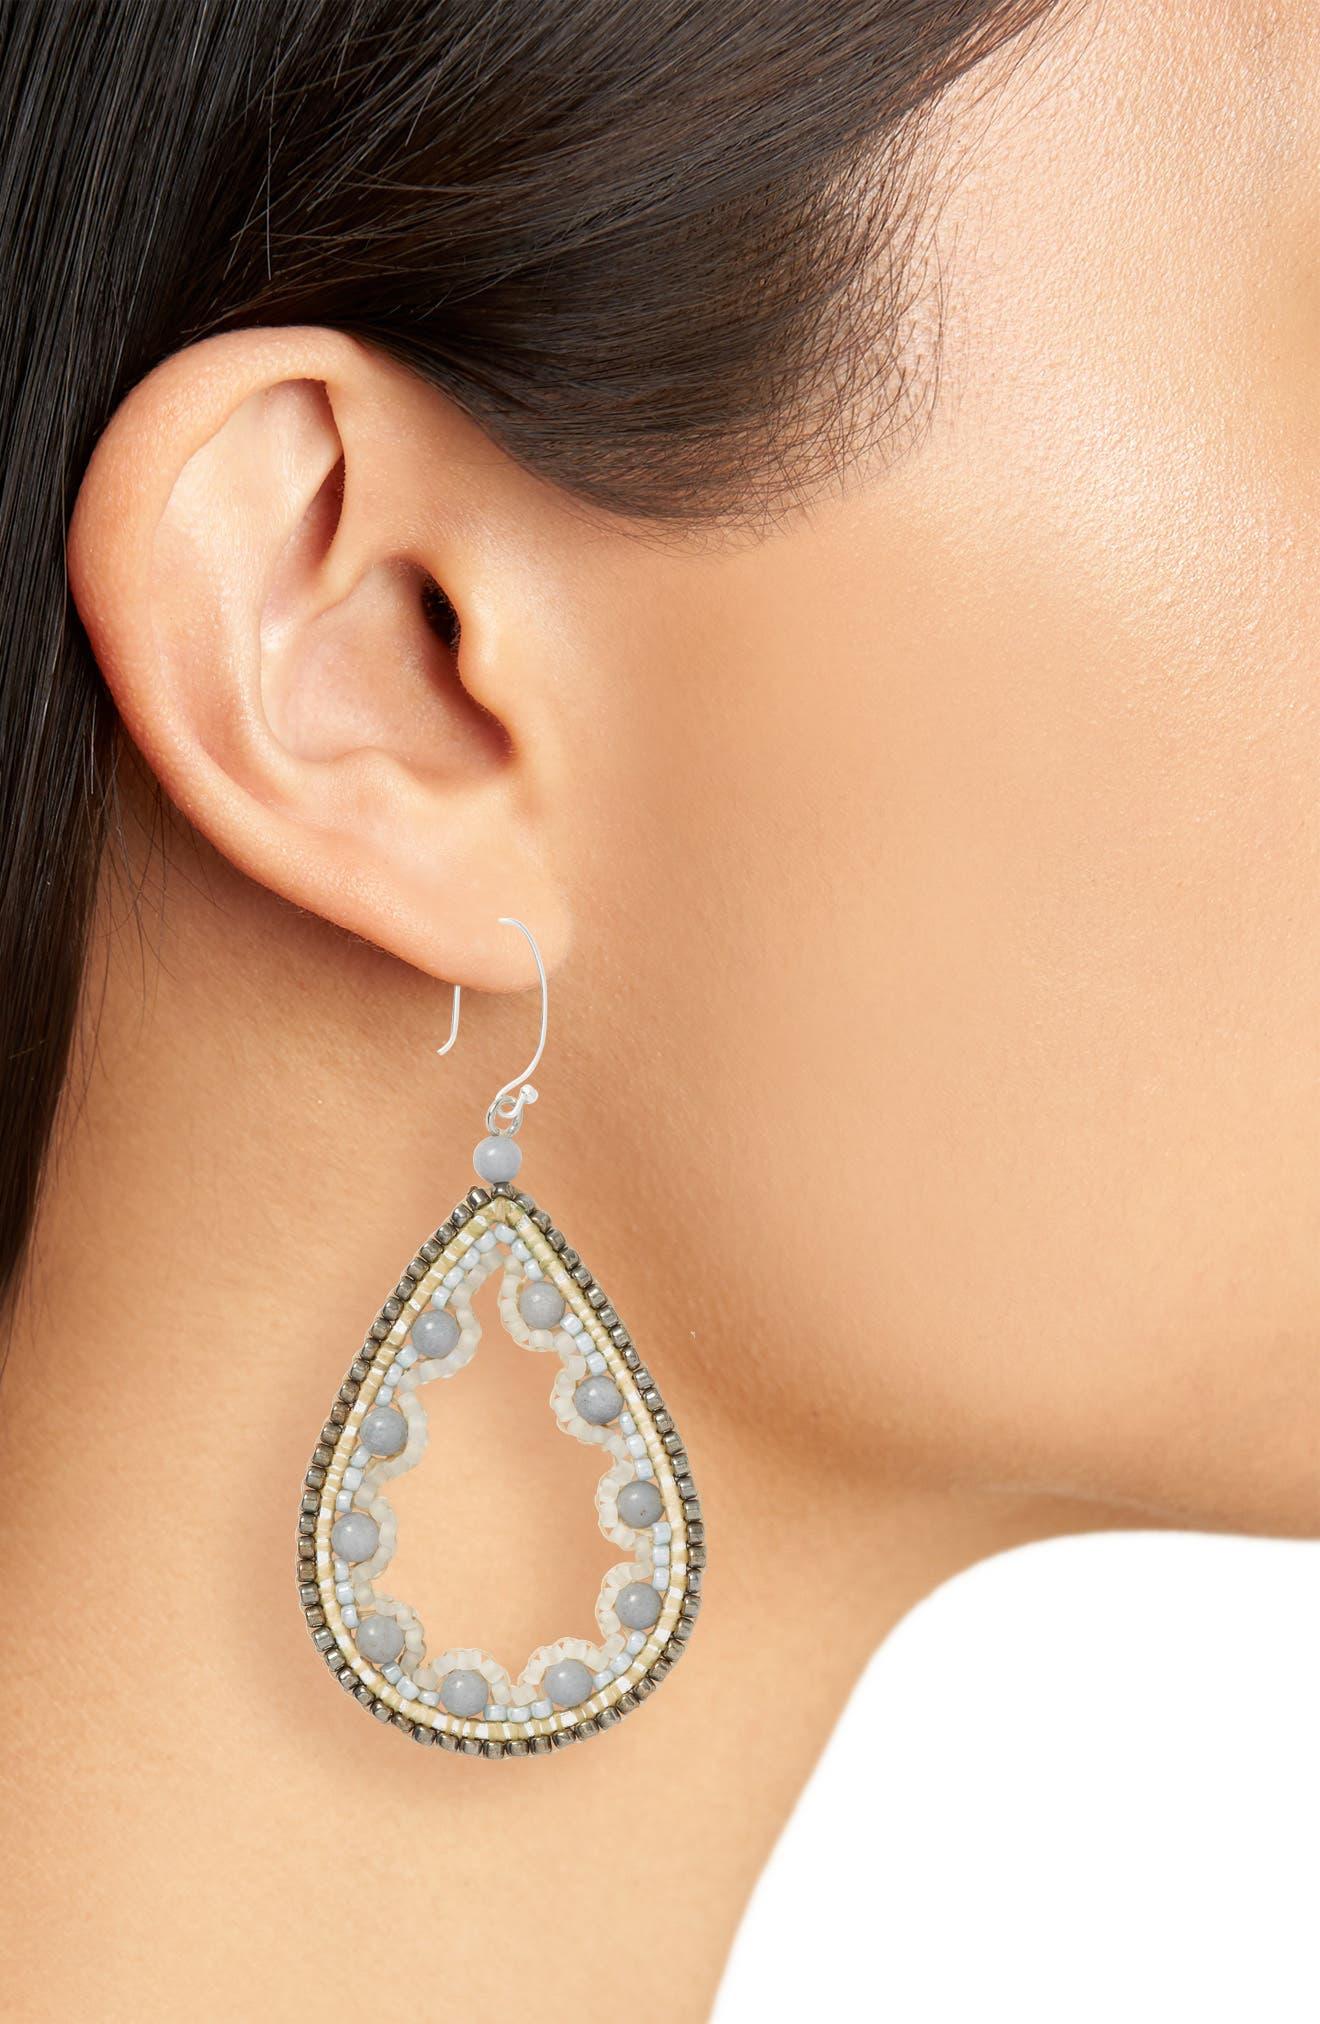 Beaded Agate Teardrop Earrings,                             Alternate thumbnail 2, color,                             100